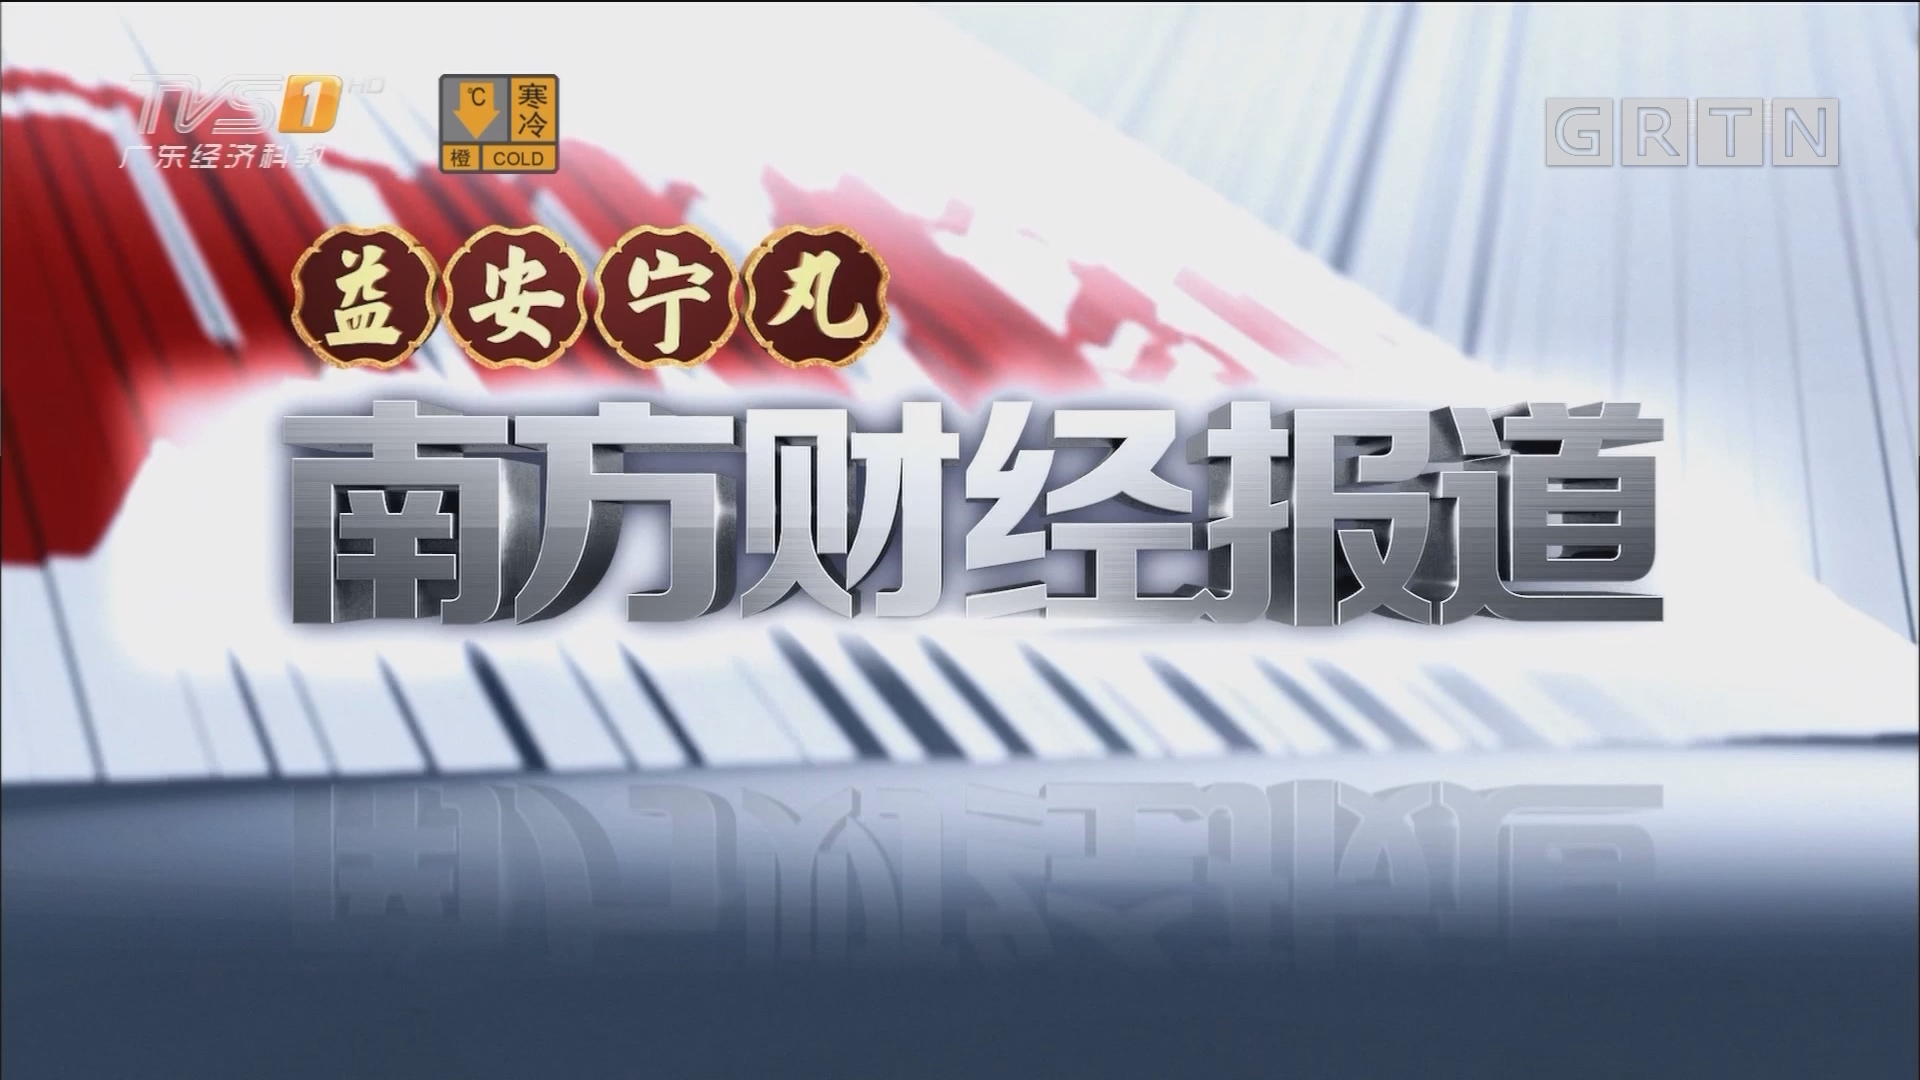 [HD][2018-01-09]南方财经报道:中国首席经济学家论坛:展望2018年经济金融形势